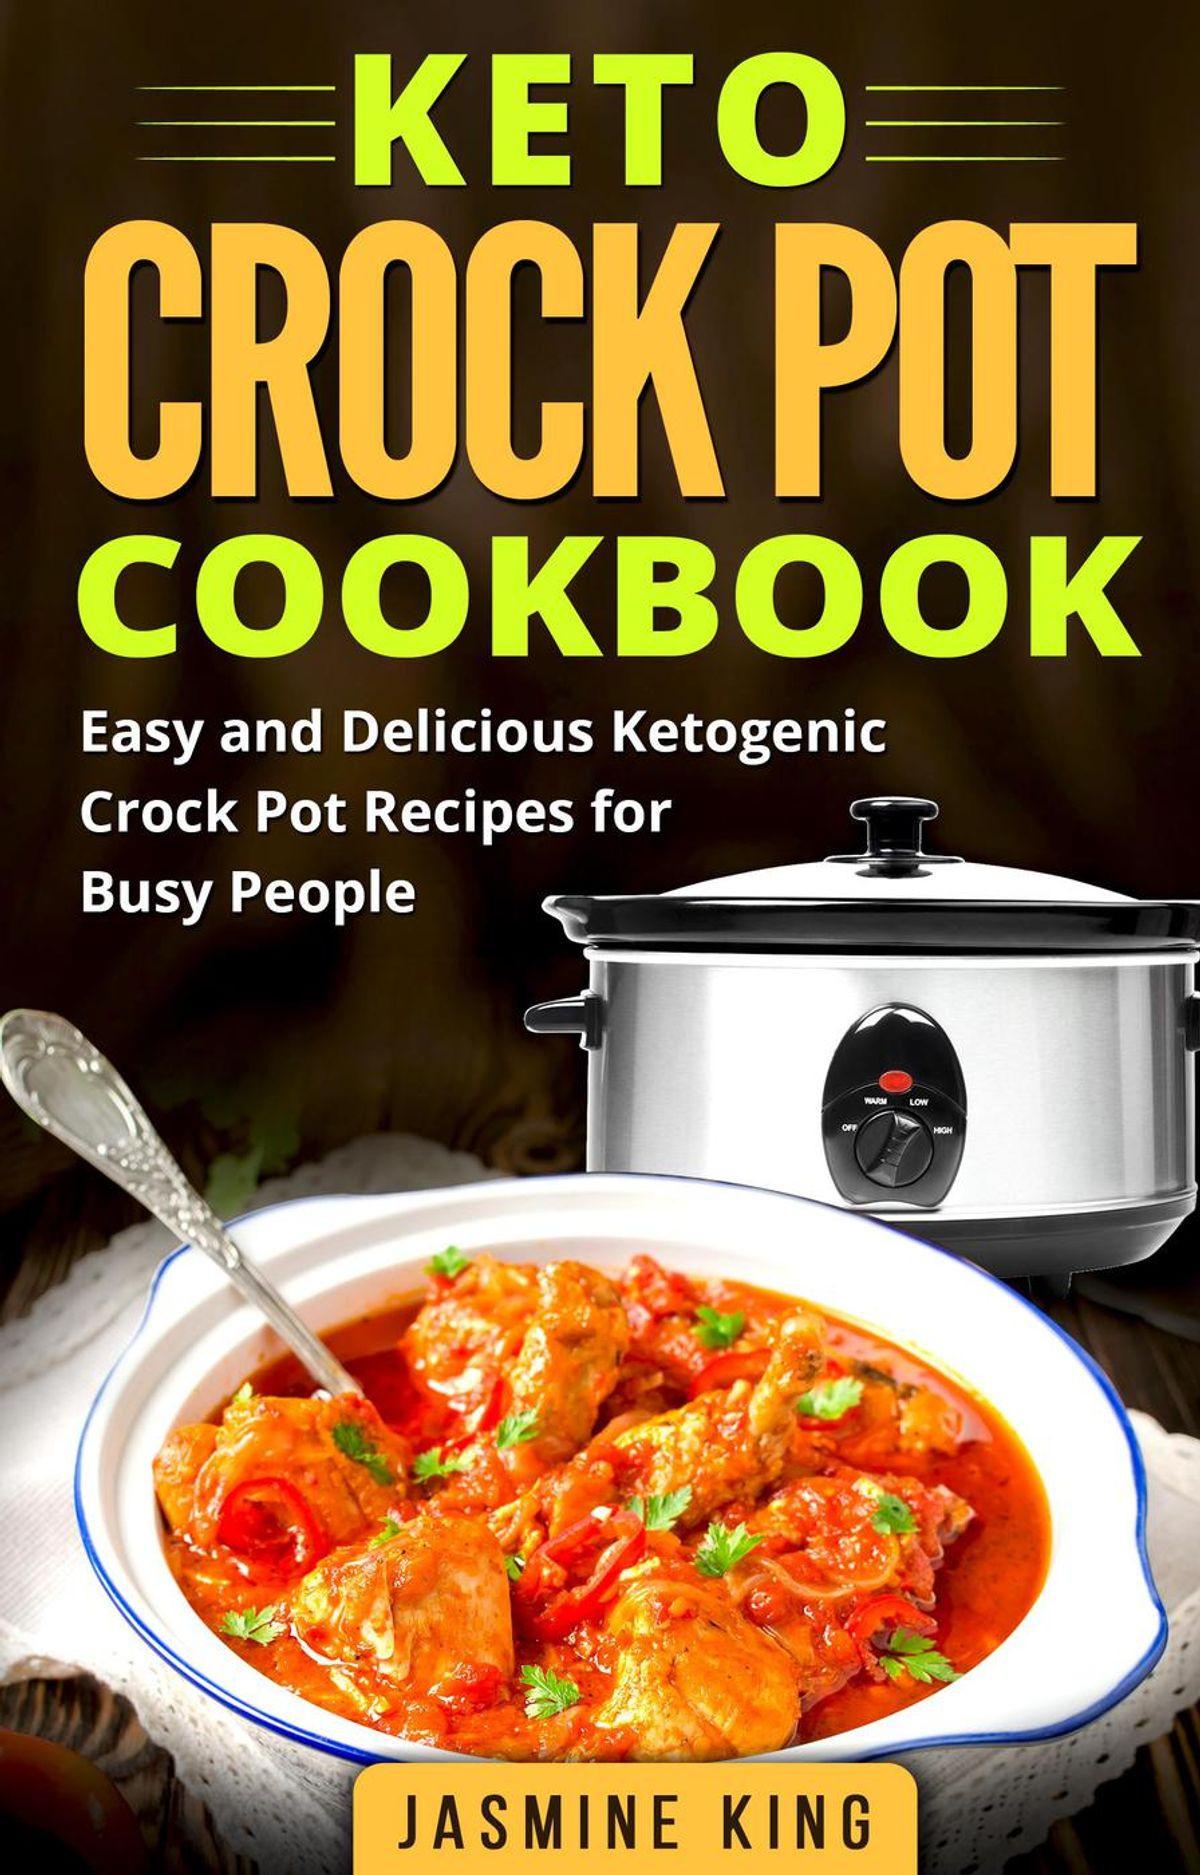 Easy Crock Pot Keto  Keto Crock Pot Cookbook Easy and Delicious Ketogenic